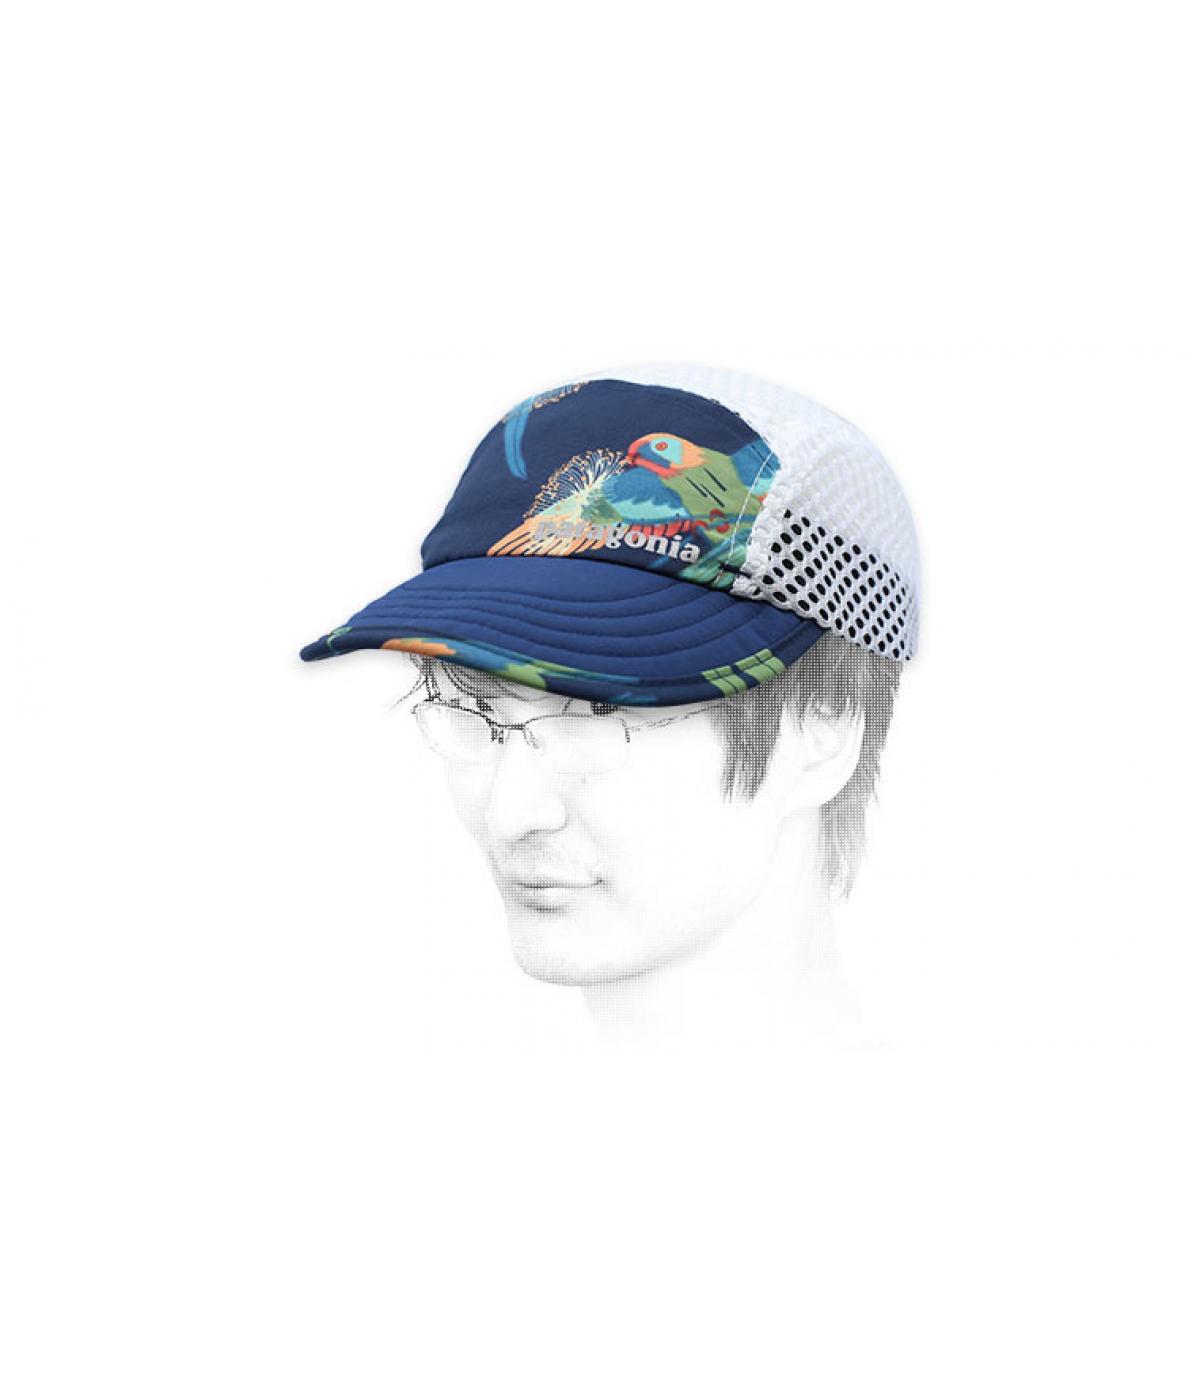 gorra Patagonia estampado